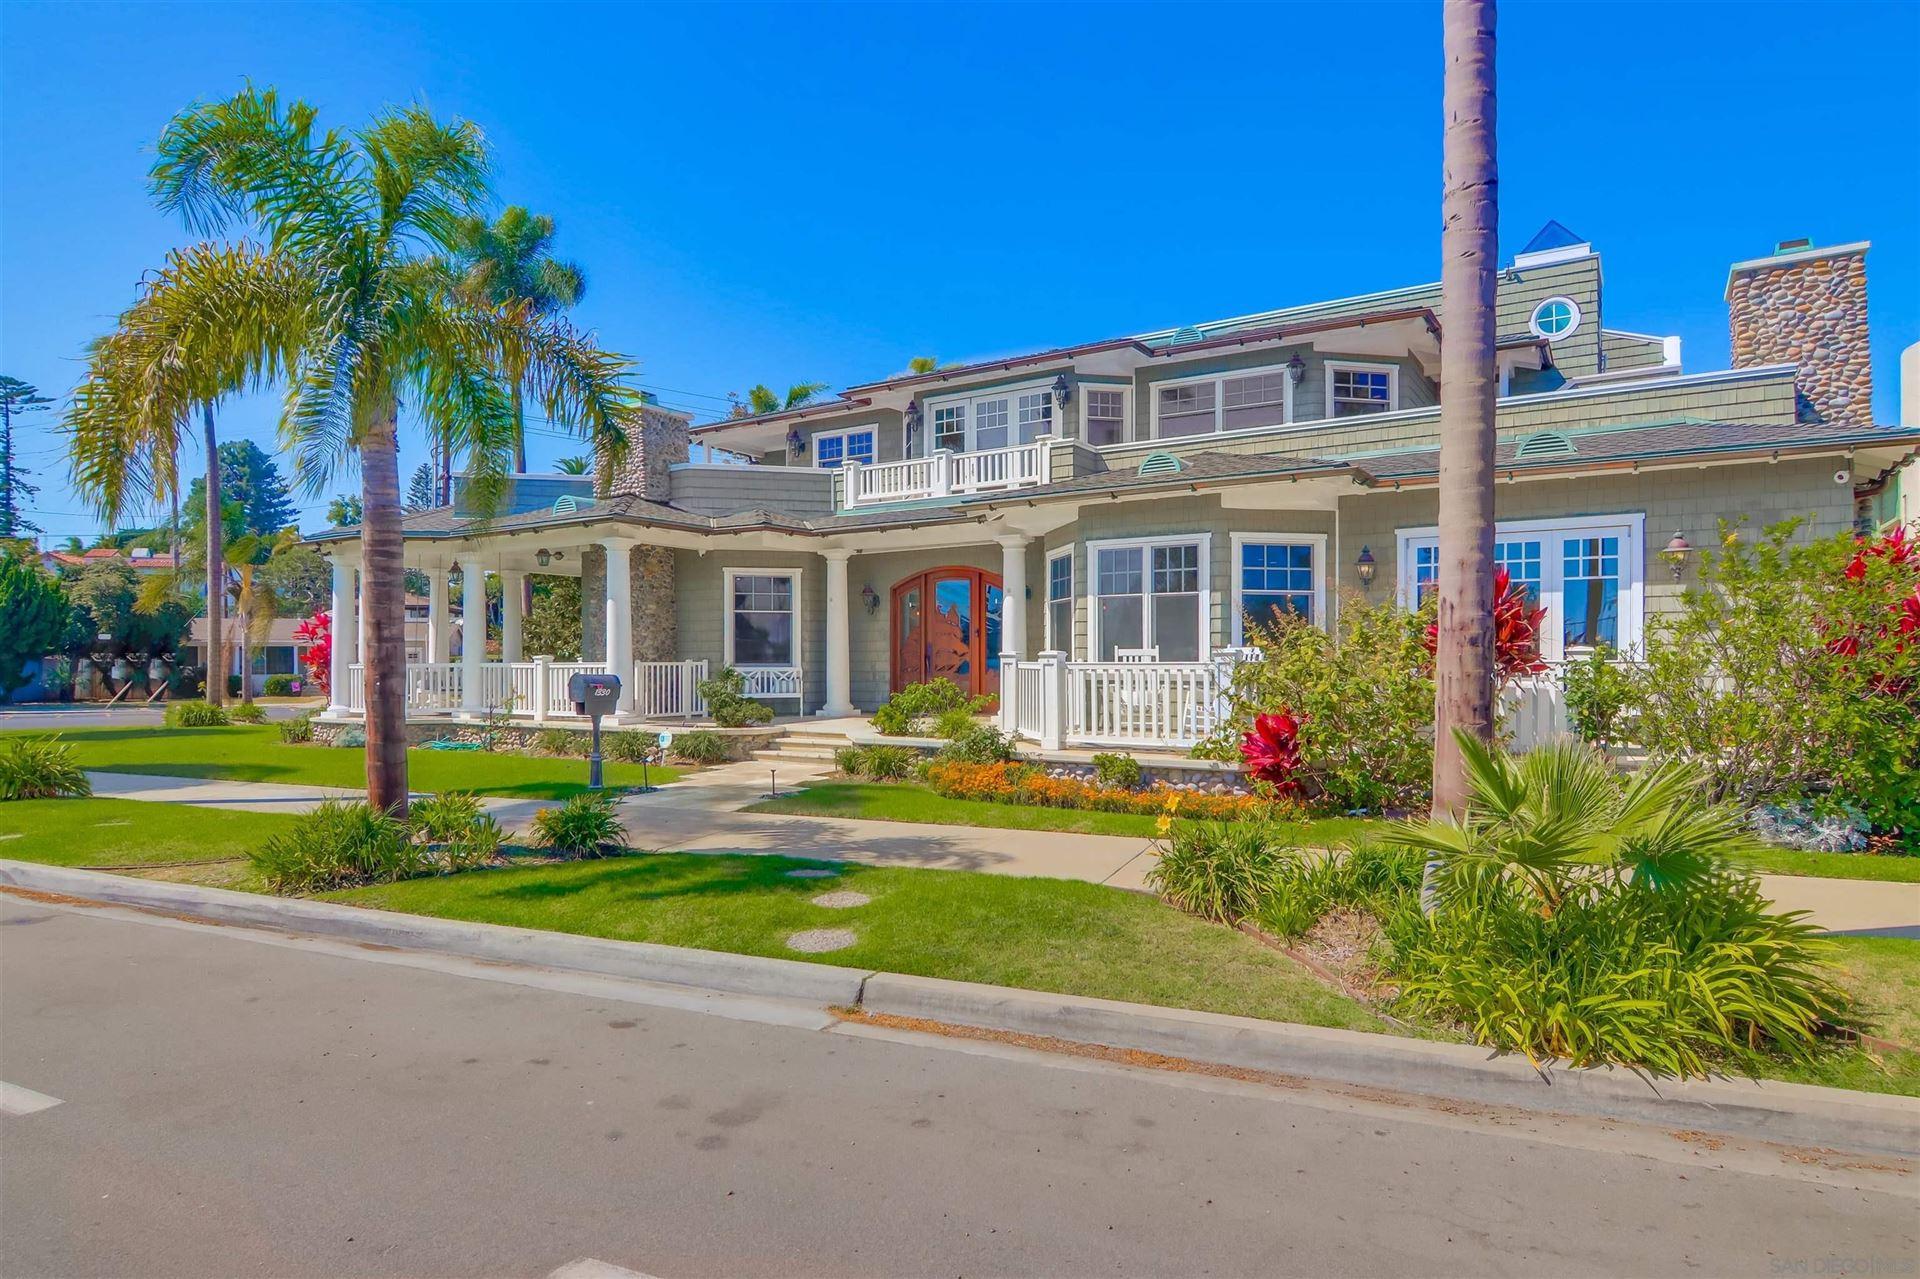 Photo of 1330 Glorietta, Coronado, CA 92118 (MLS # 210026543)